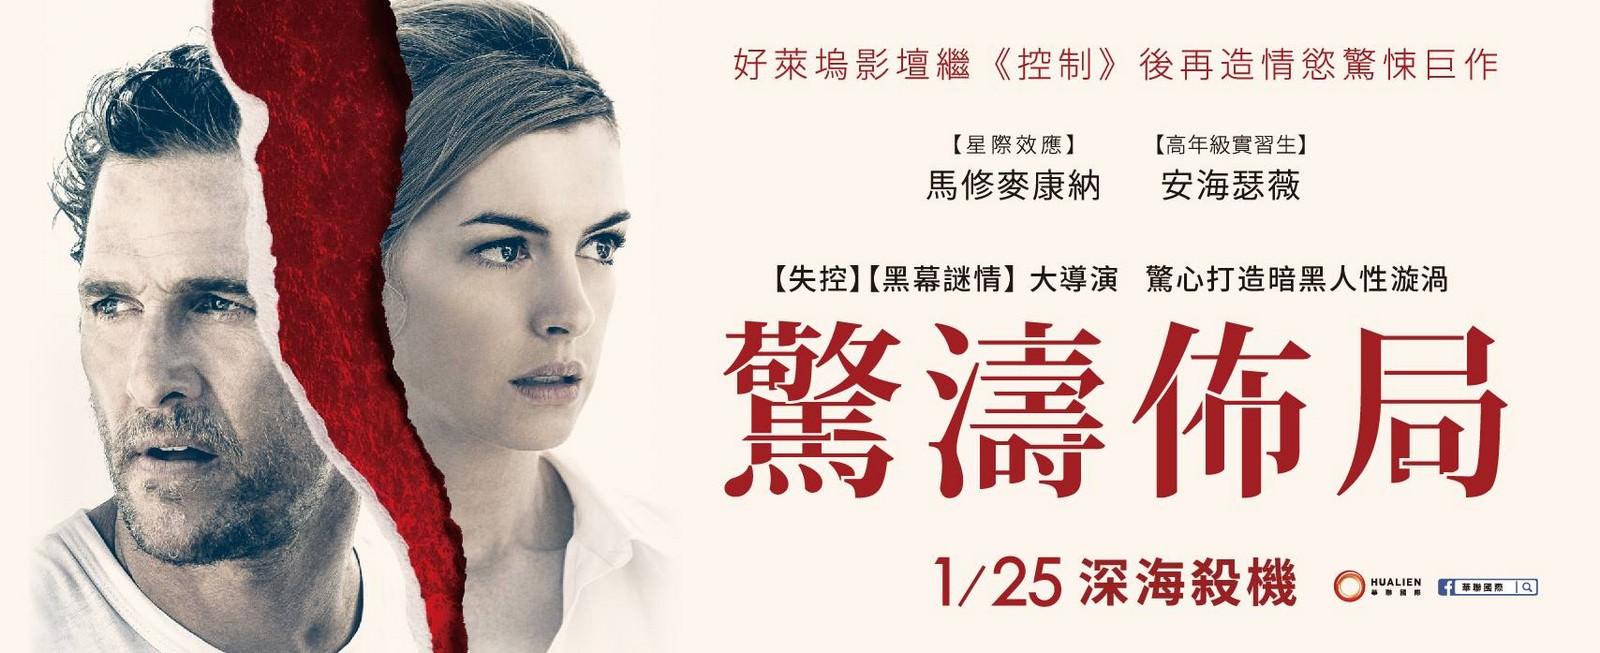 Movie, Serenity(美國, 2019年) / 驚濤佈局(台灣) / 宁静(網路), 電影海報, 台灣, 橫版